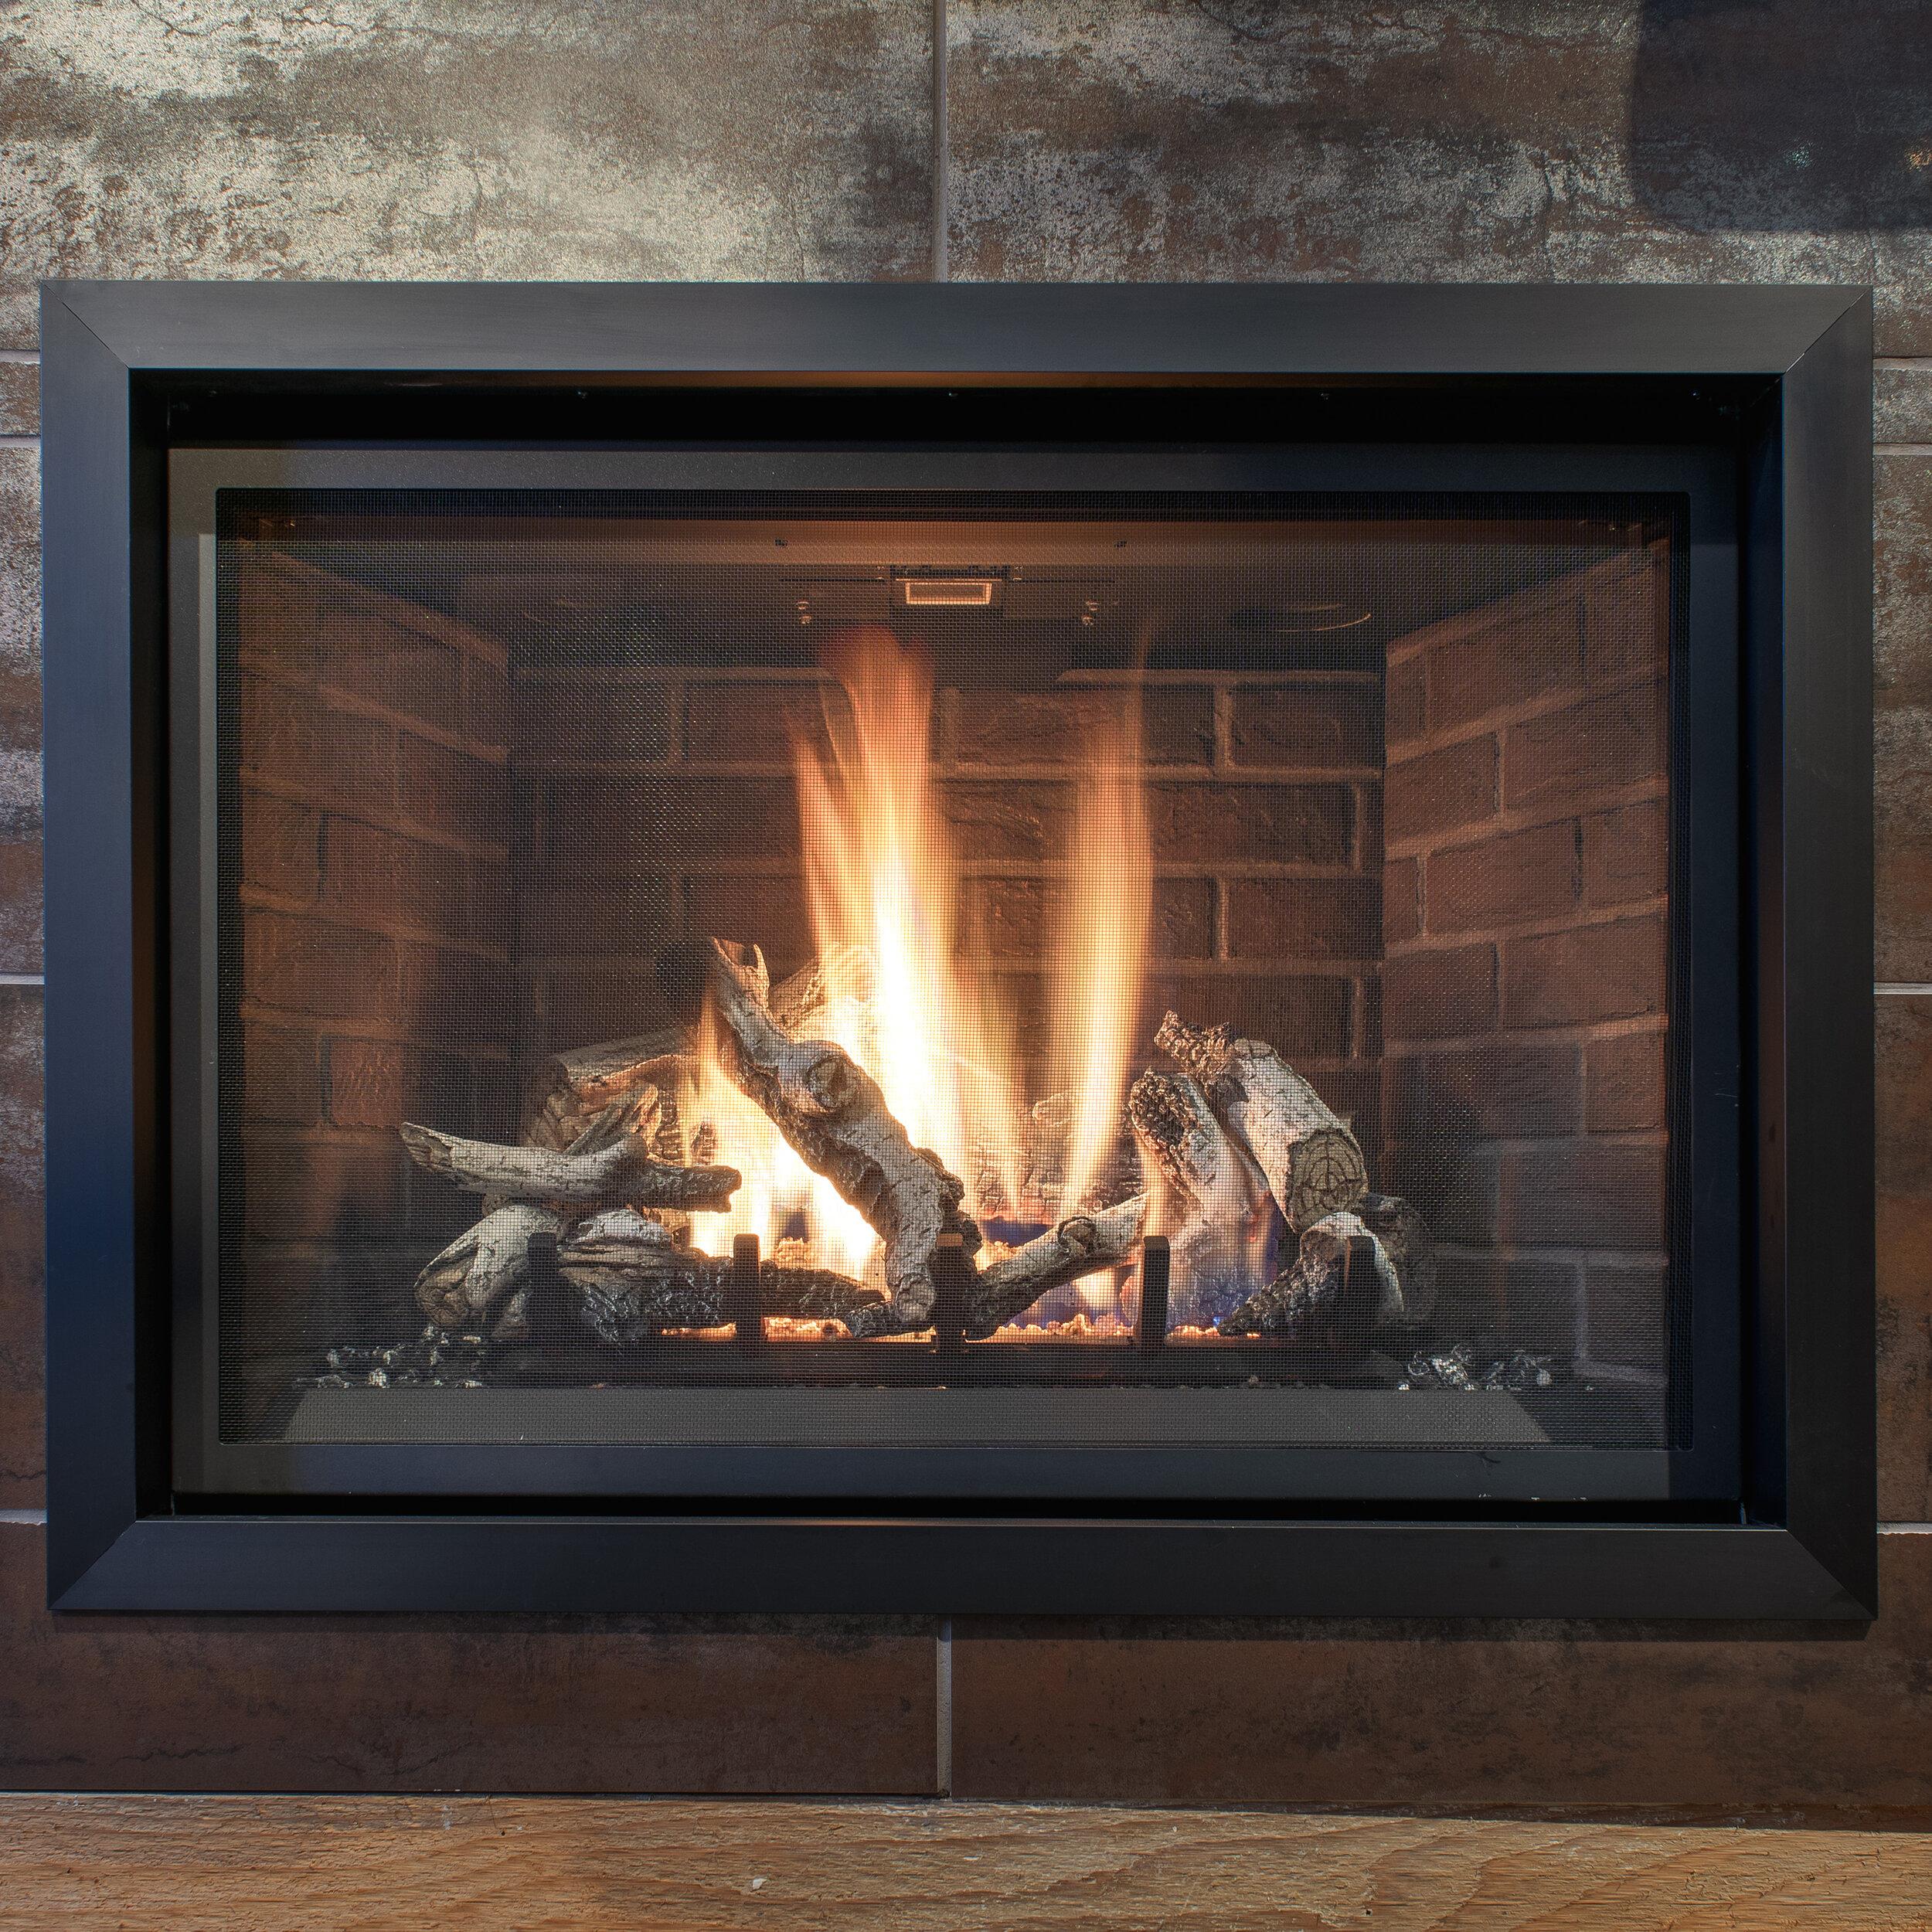 FireplaceX 864 Clean Face - · Direct Vent Gas Fireplace - 31,000 BTU· Handmade Brick Firebox Panels· Tile Trim Kit· Birch Logs with Embers· Green Smart Remote Control· Dual Convection Fans· Powerful Heater· Split-Flow Dancing-Fyre™ Burner